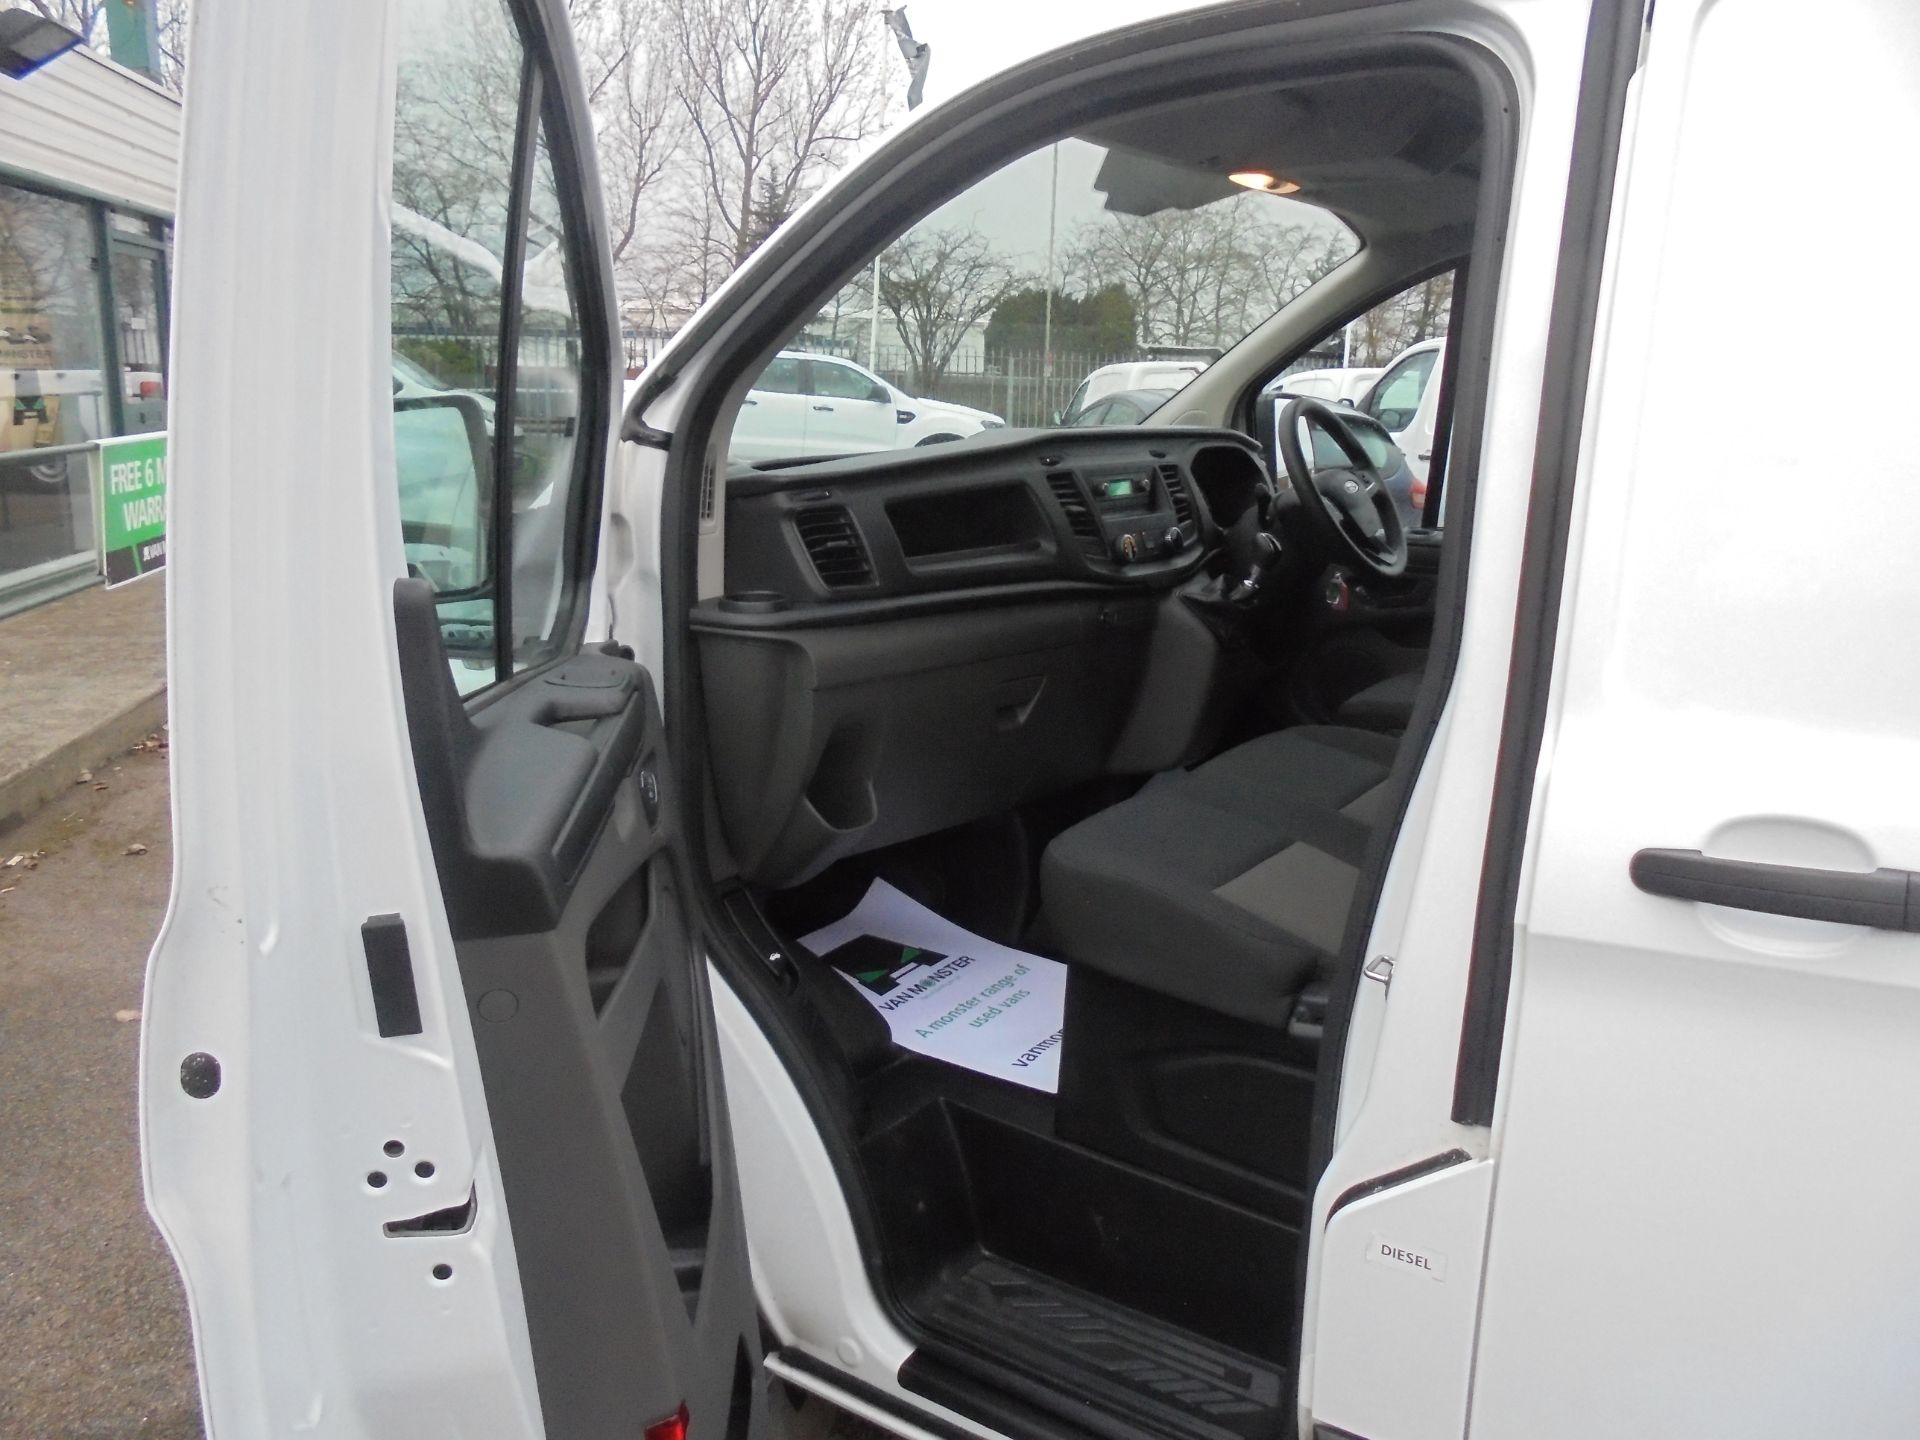 2018 Ford Transit Custom 300 L1 FWD 2.0 TDCI 105PS LOW ROOF EURO 6 (BD18EUA) Image 12